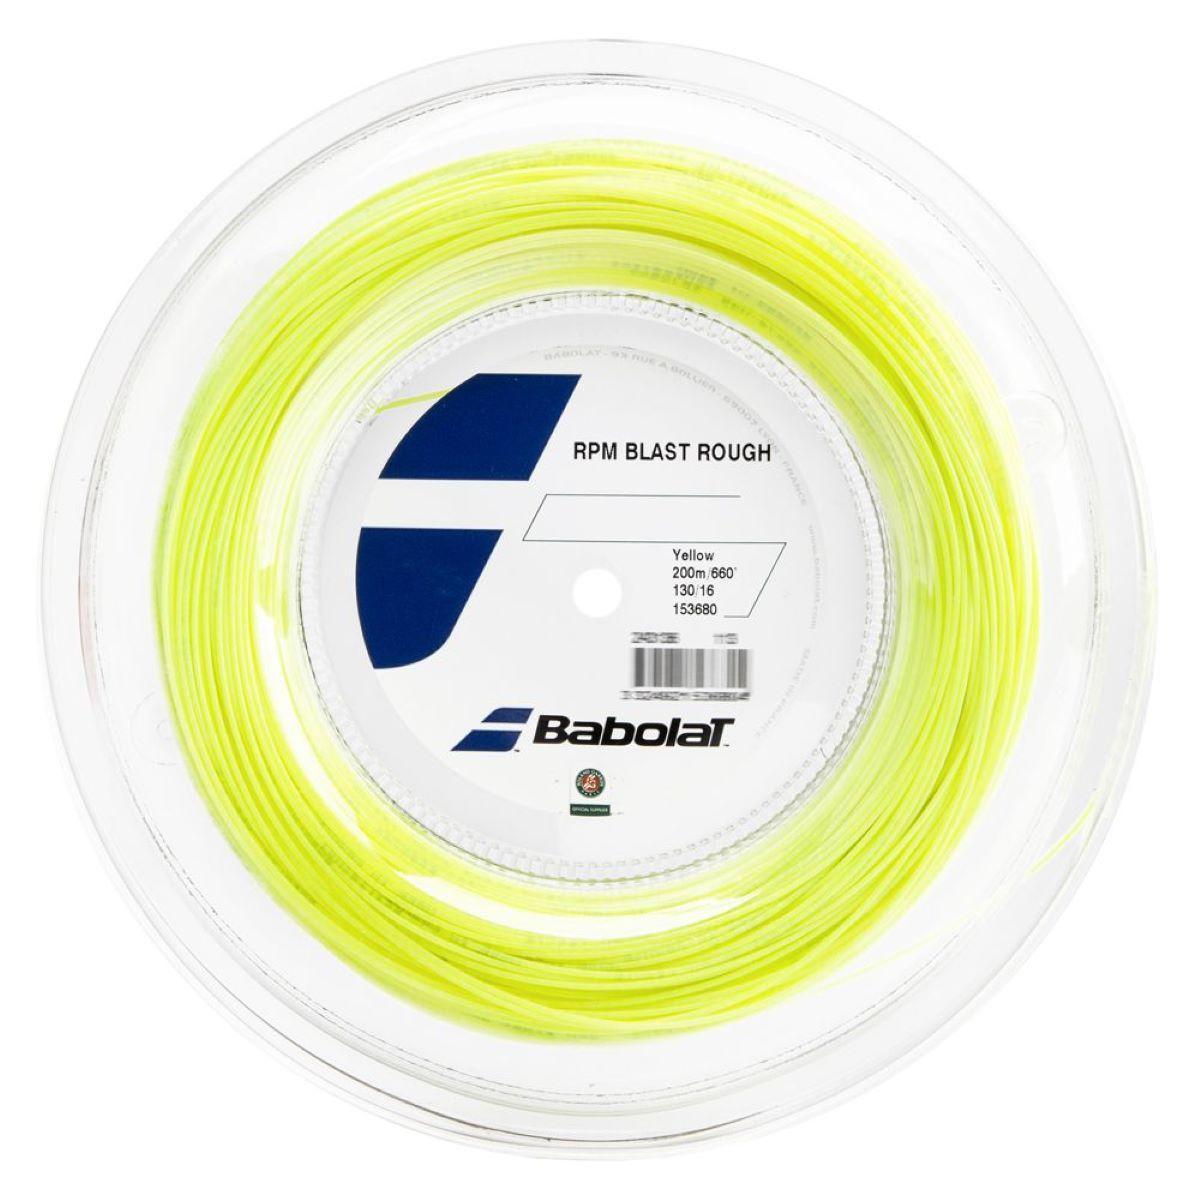 Corda Babolat RPM Blast Rough 16/1,30mm - Yellow - Rolo com 200mts